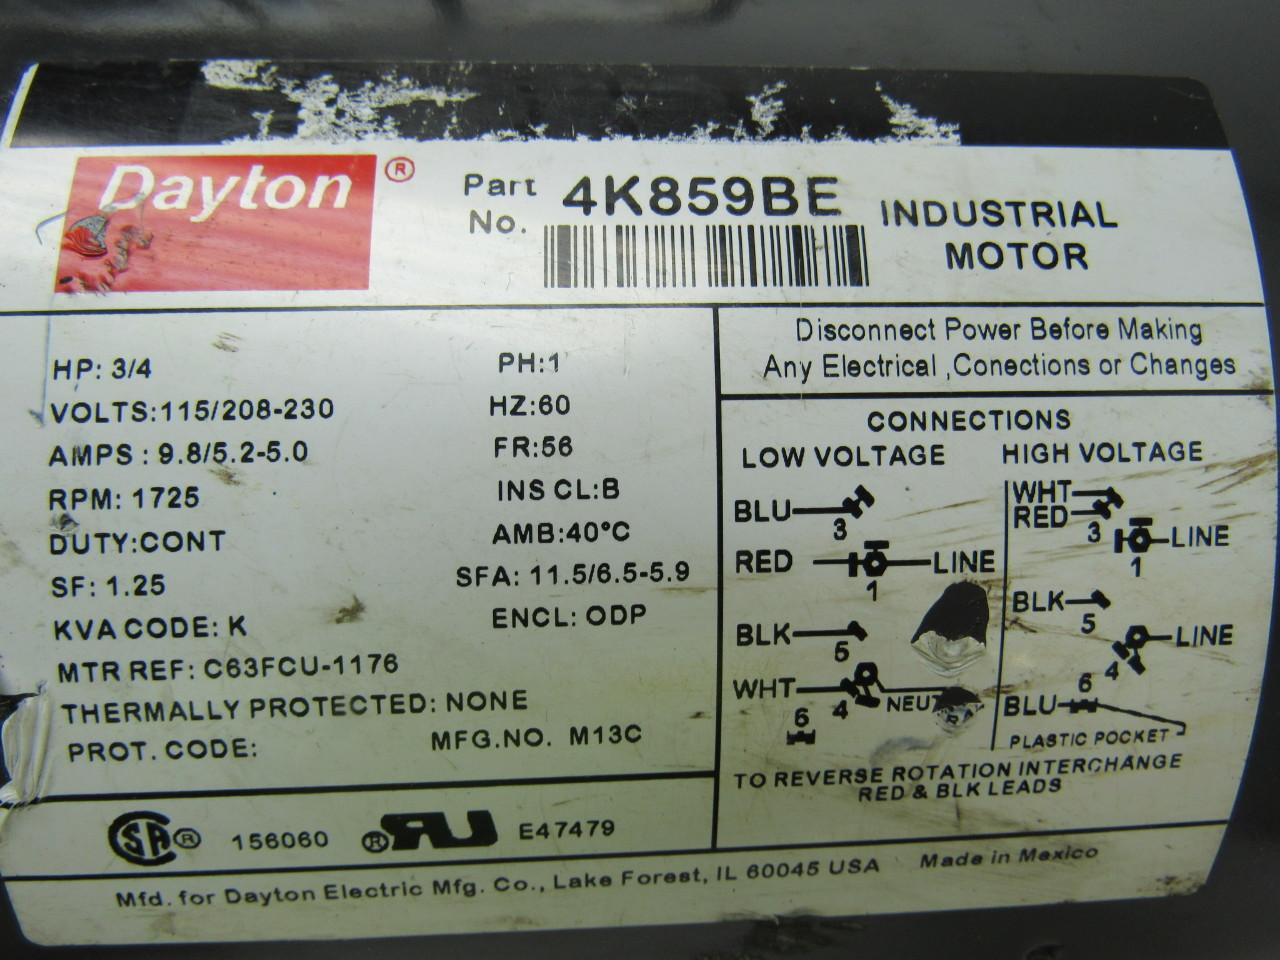 Dayton 3/4 Hp 115v Electric Motors Wiring Diagram on